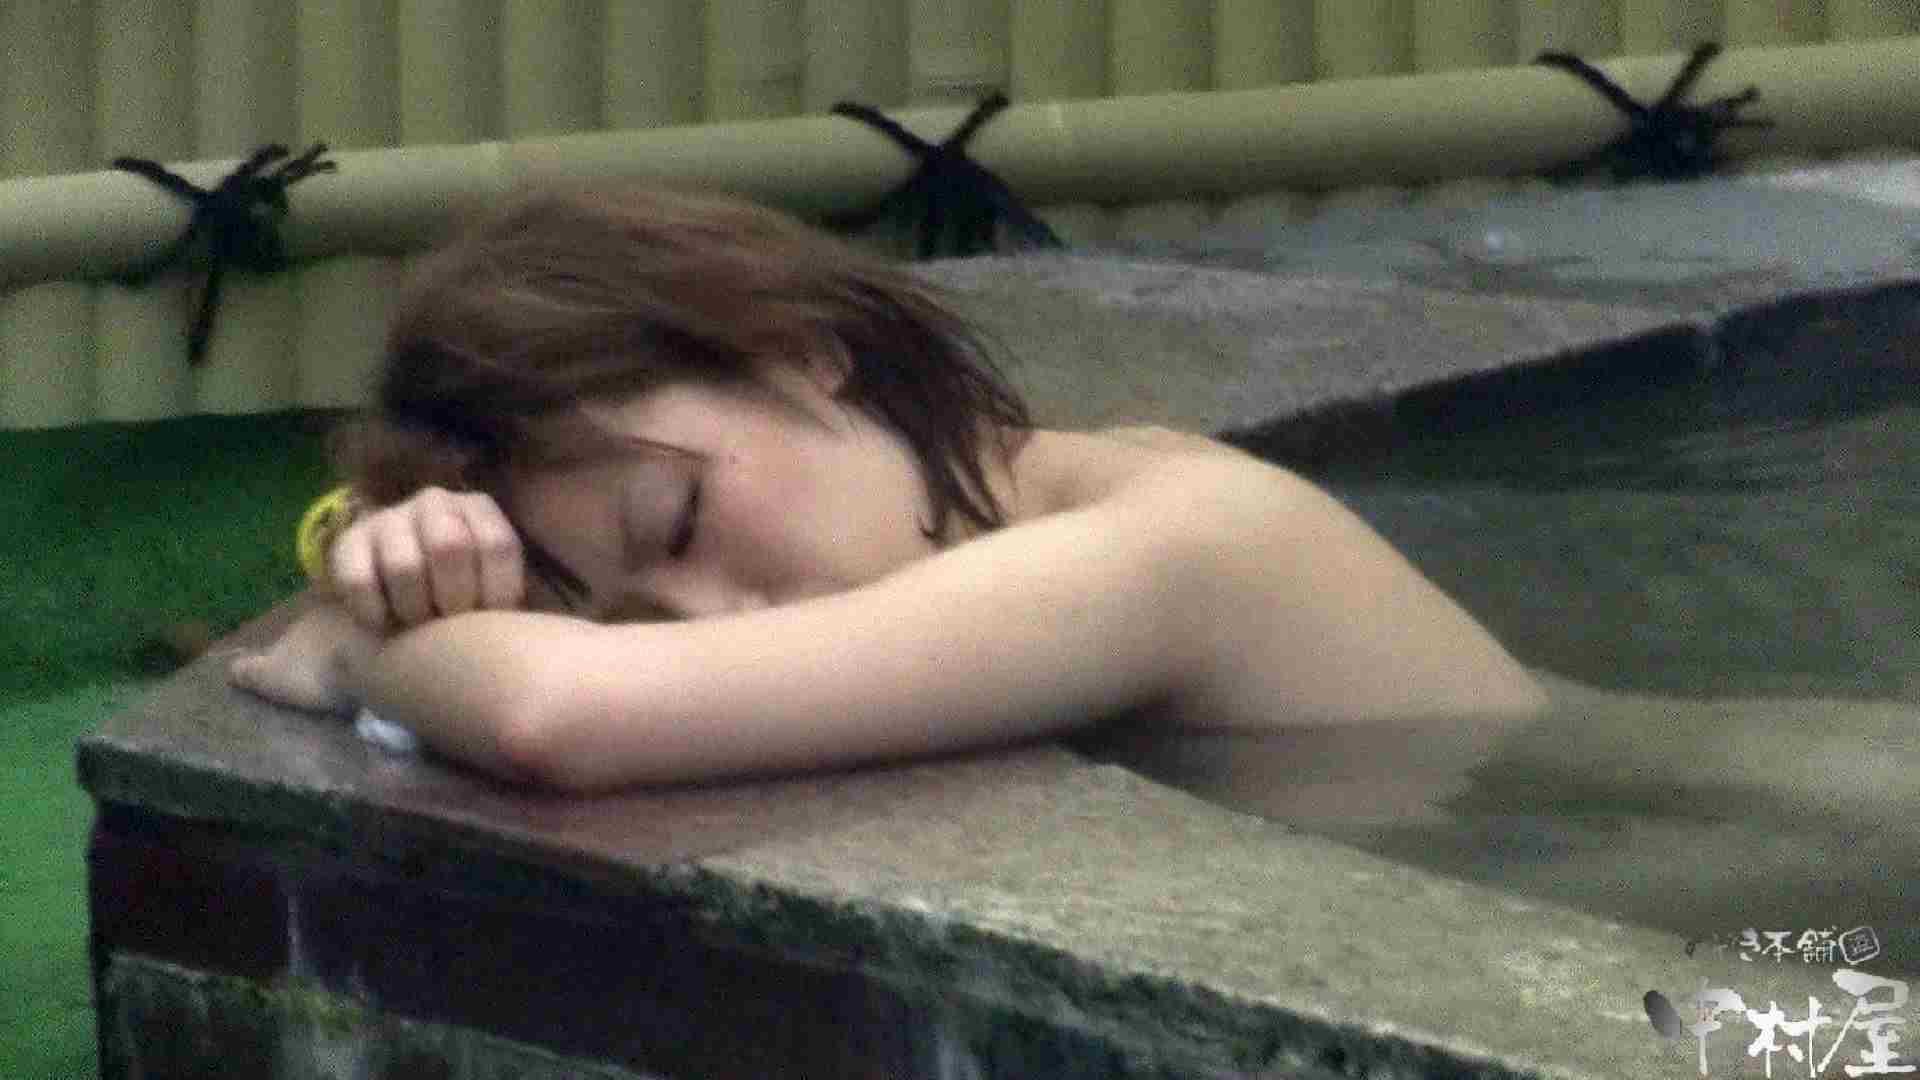 Aquaな露天風呂Vol.918 0  55連発 14